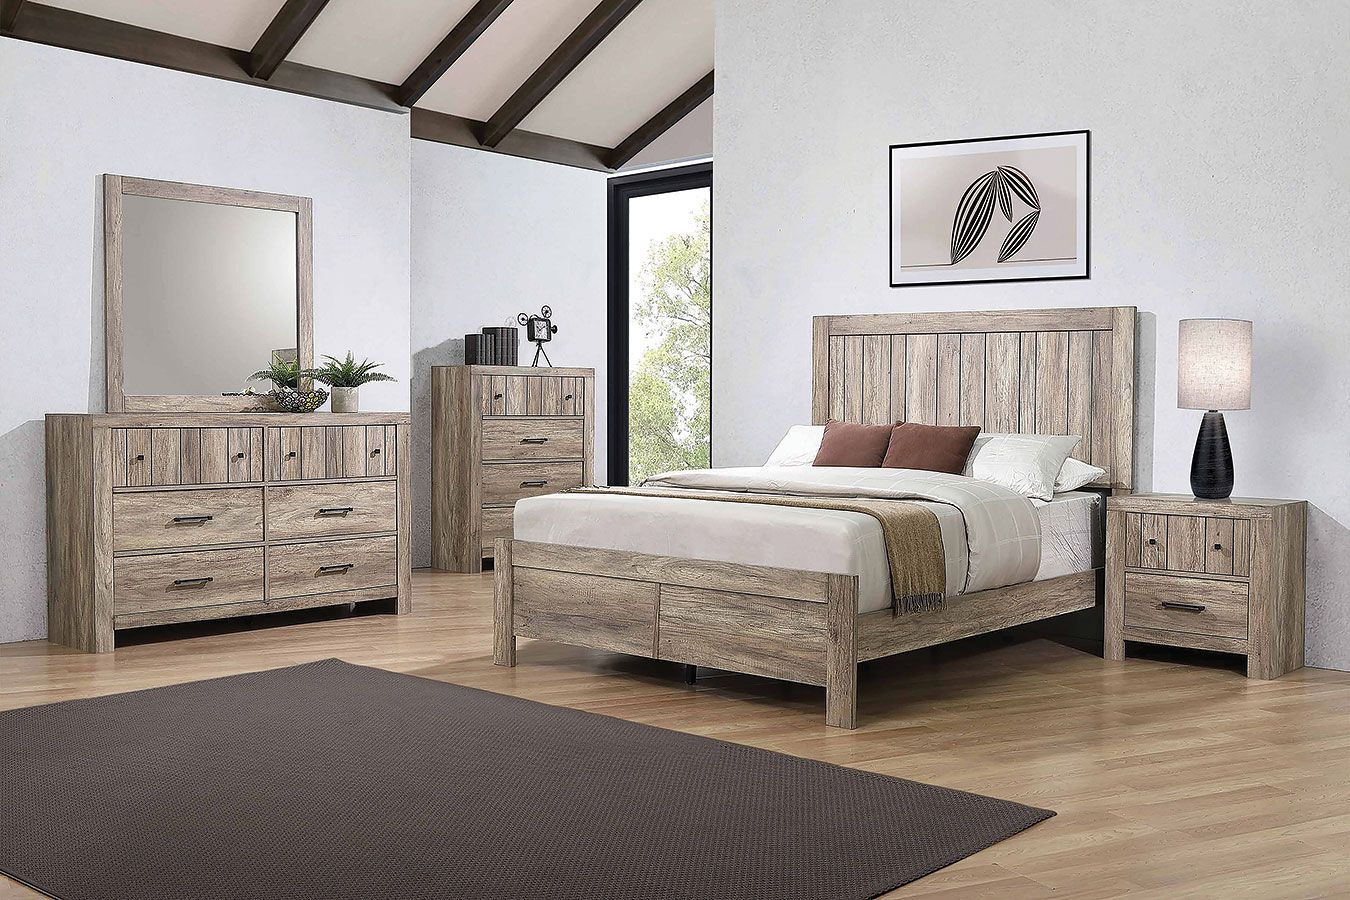 Adelaide Panel Bedroom Set Furniture, Oak bedroom